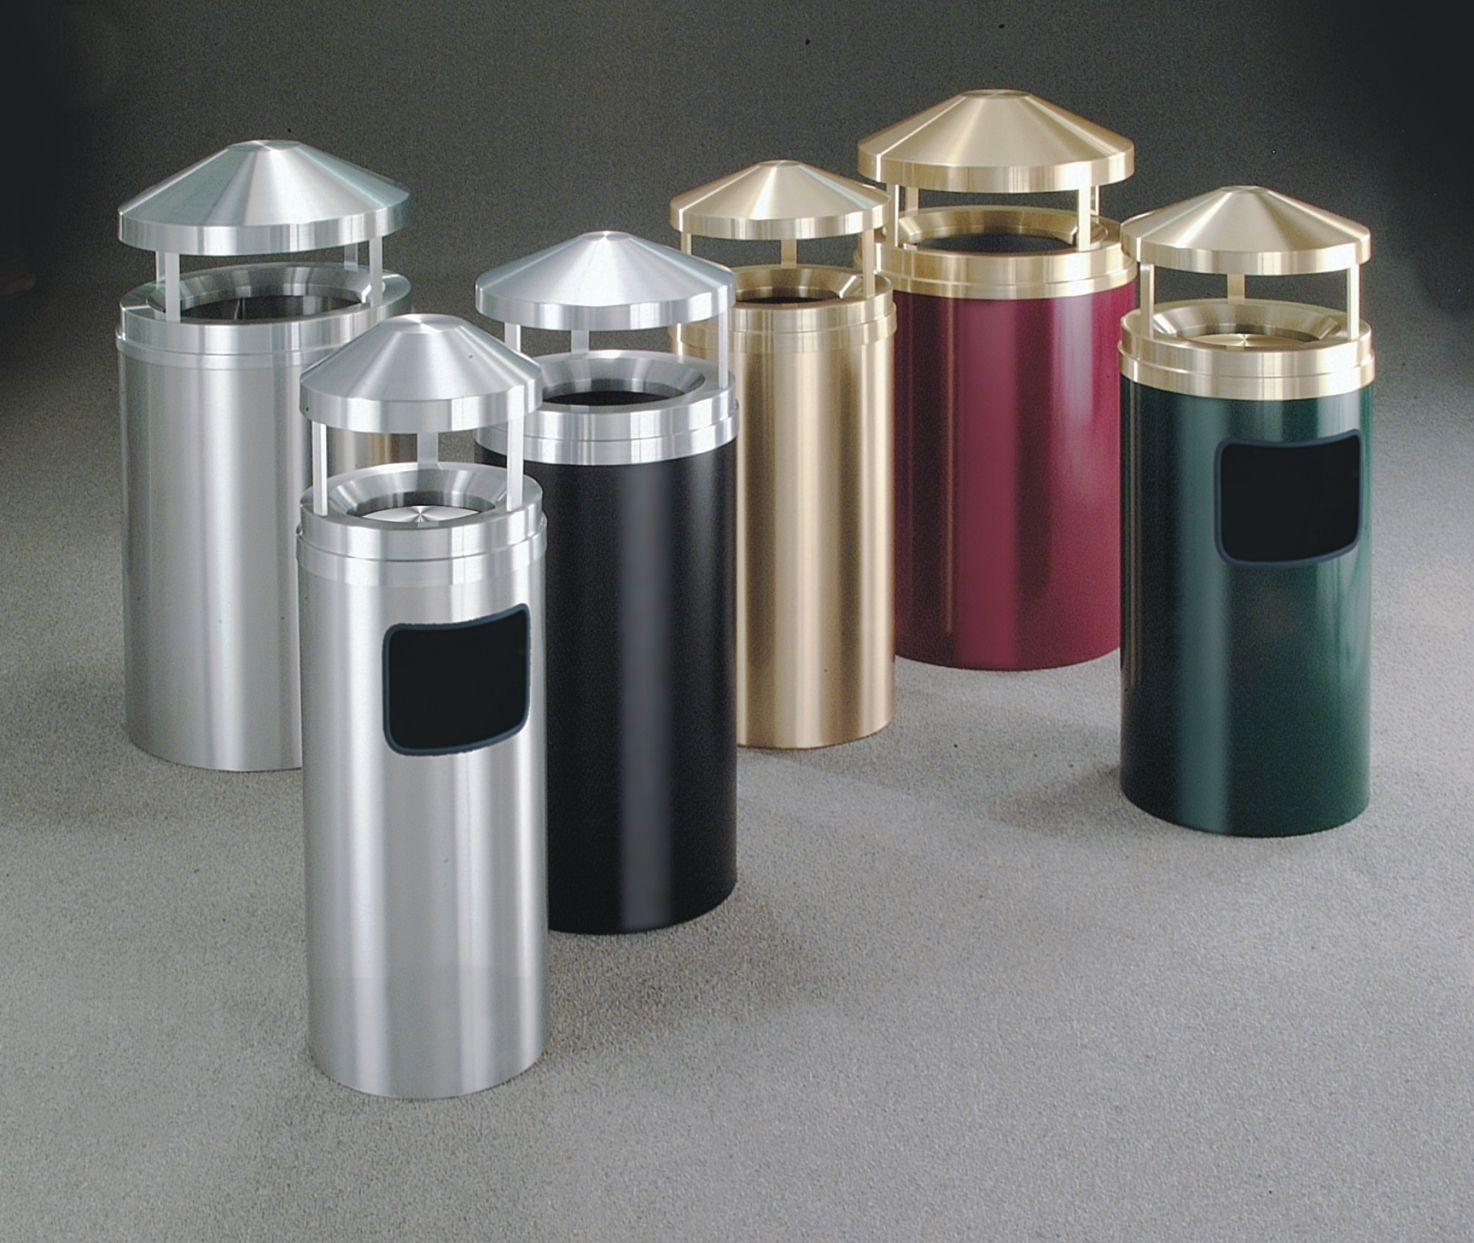 glaro-canopy-top-receptacles.jpg